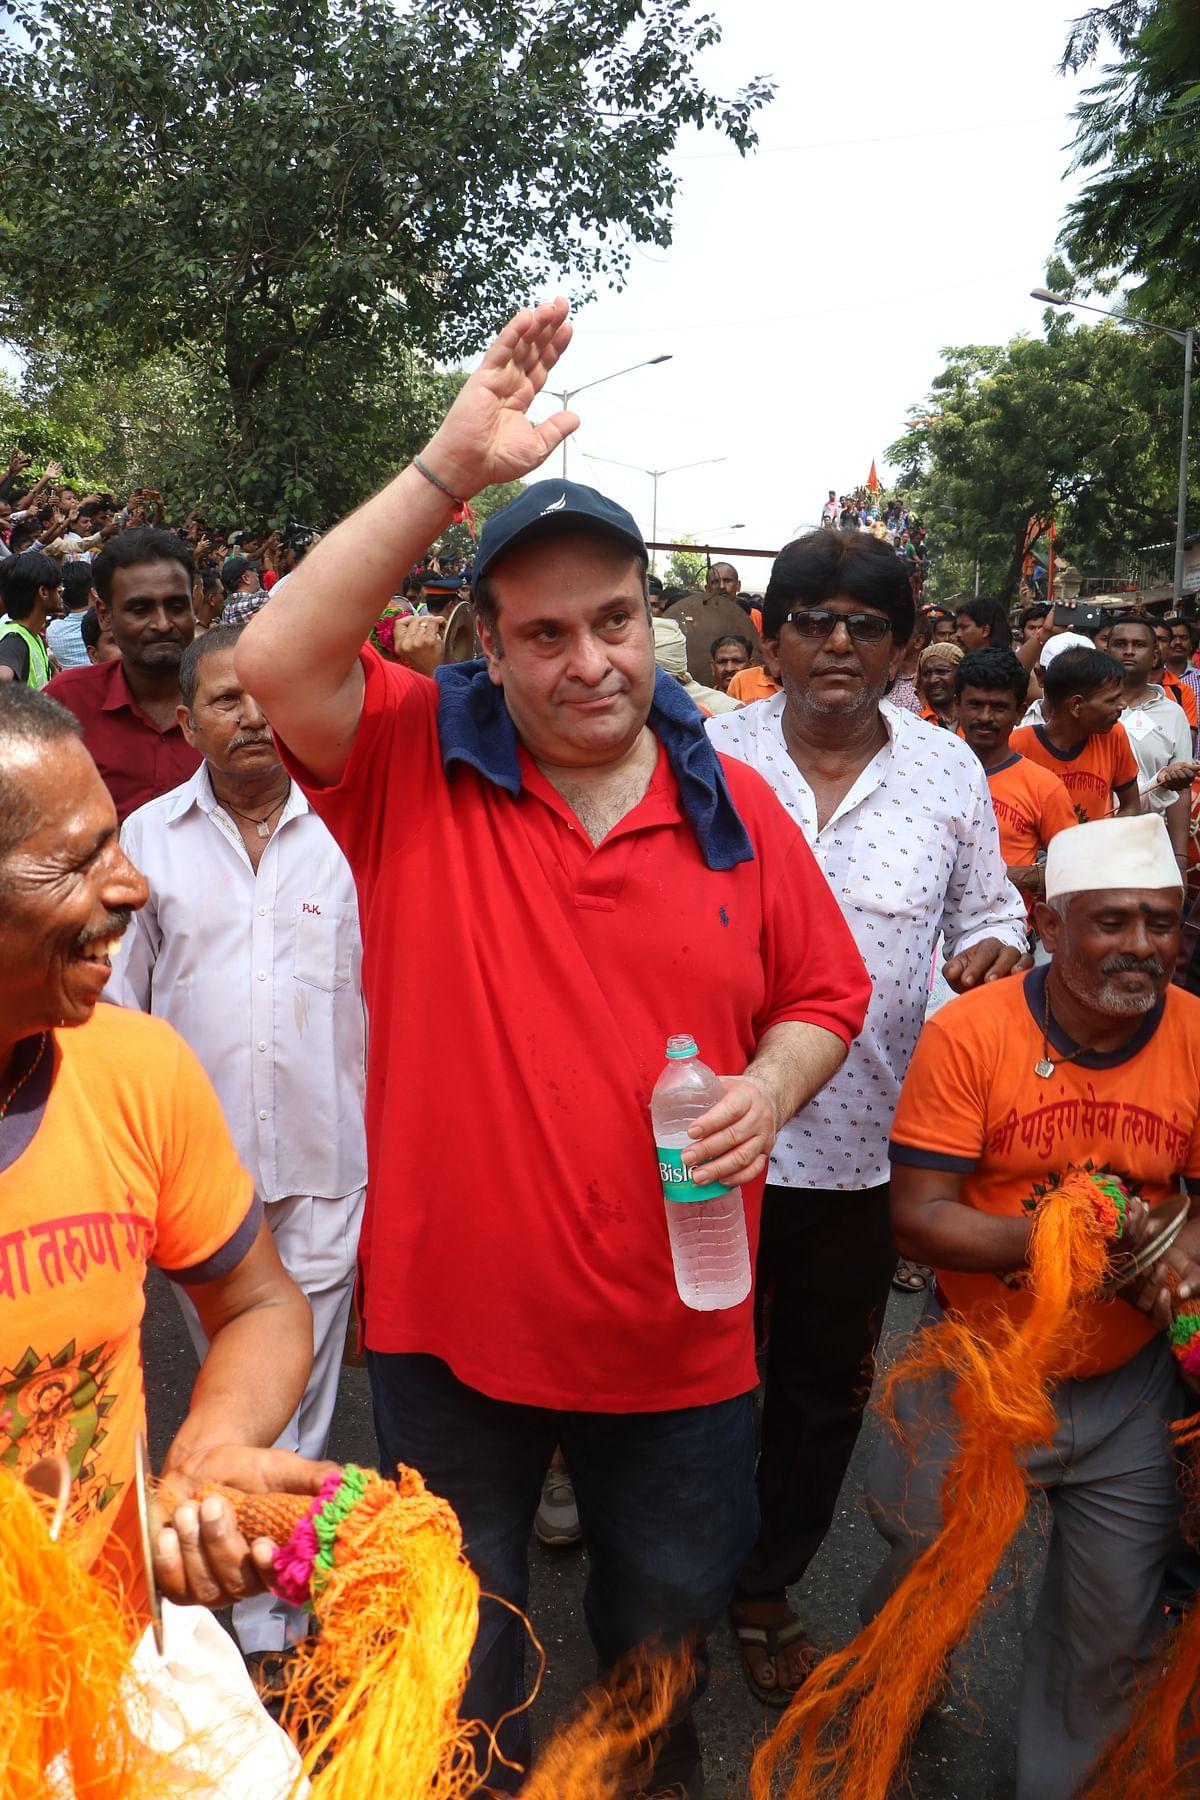 Rajiv Kapoor joins the procession.